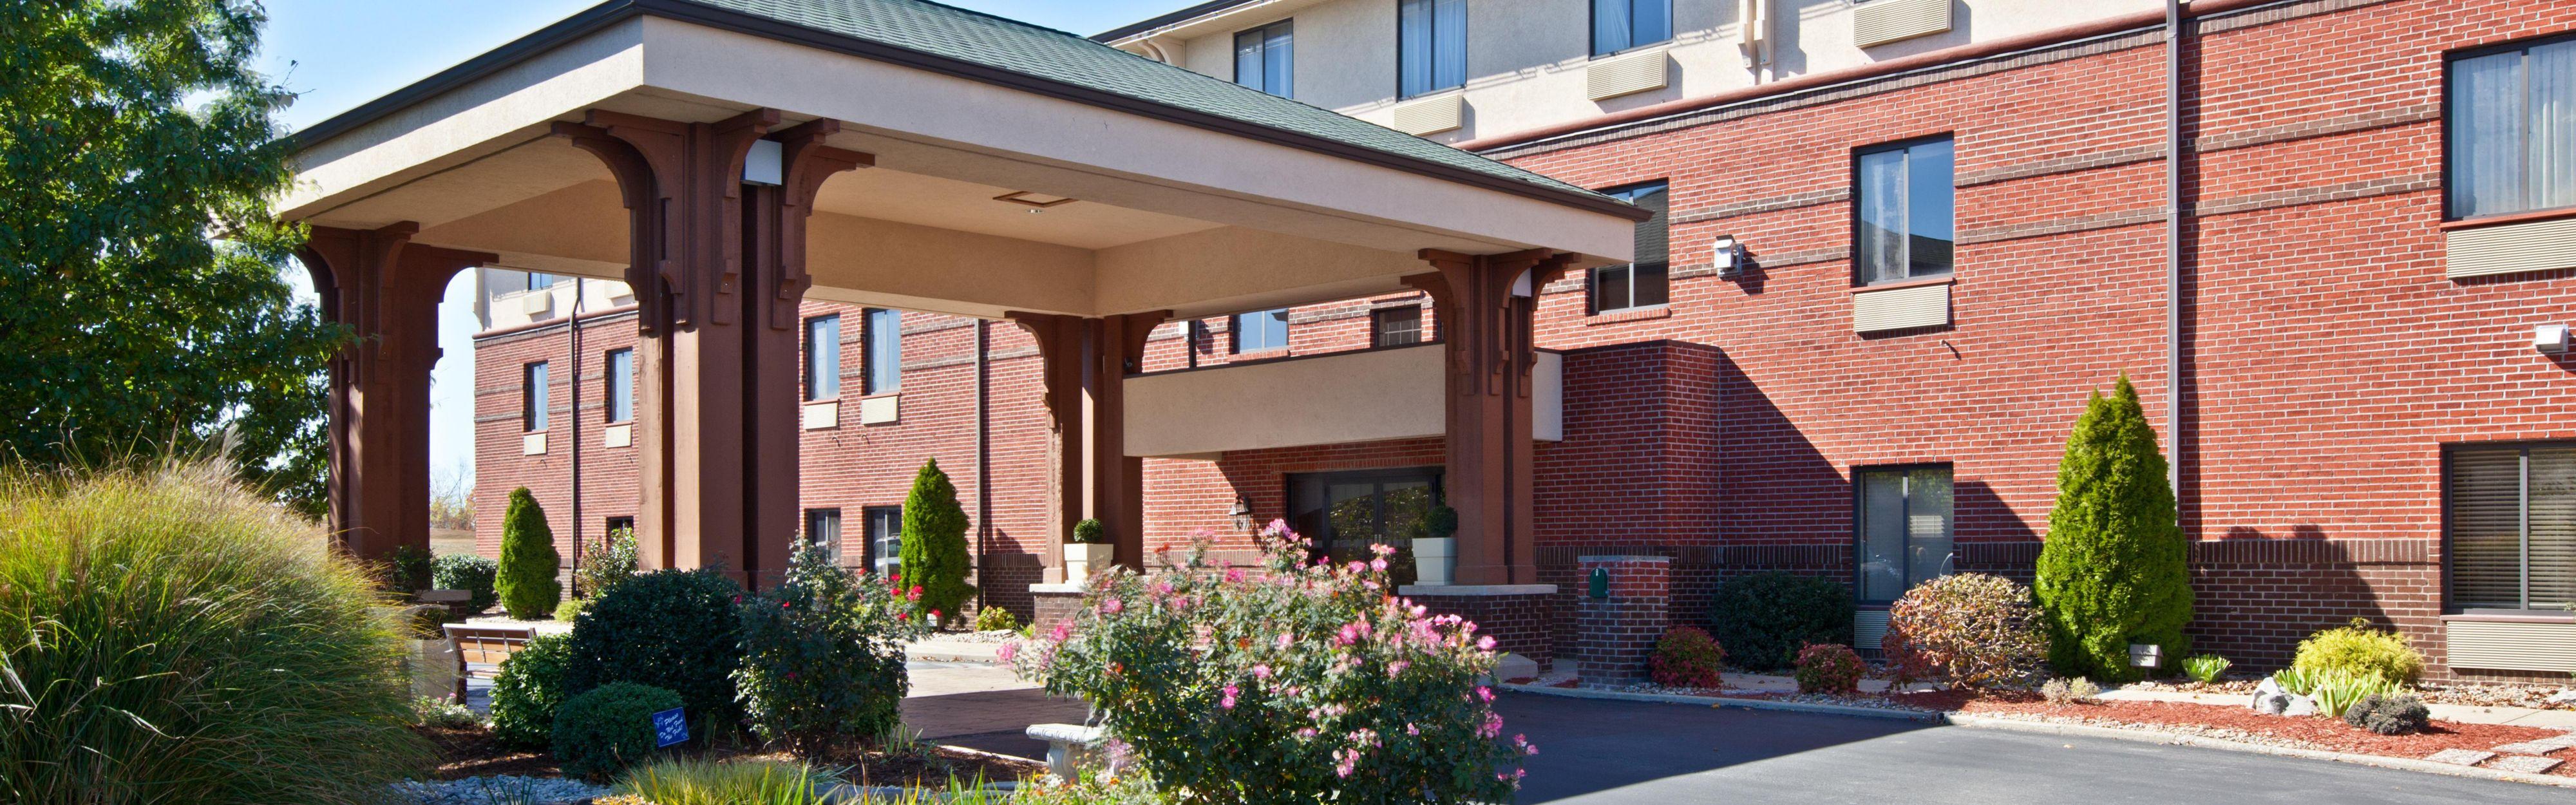 Holiday Inn Express Corydon image 0